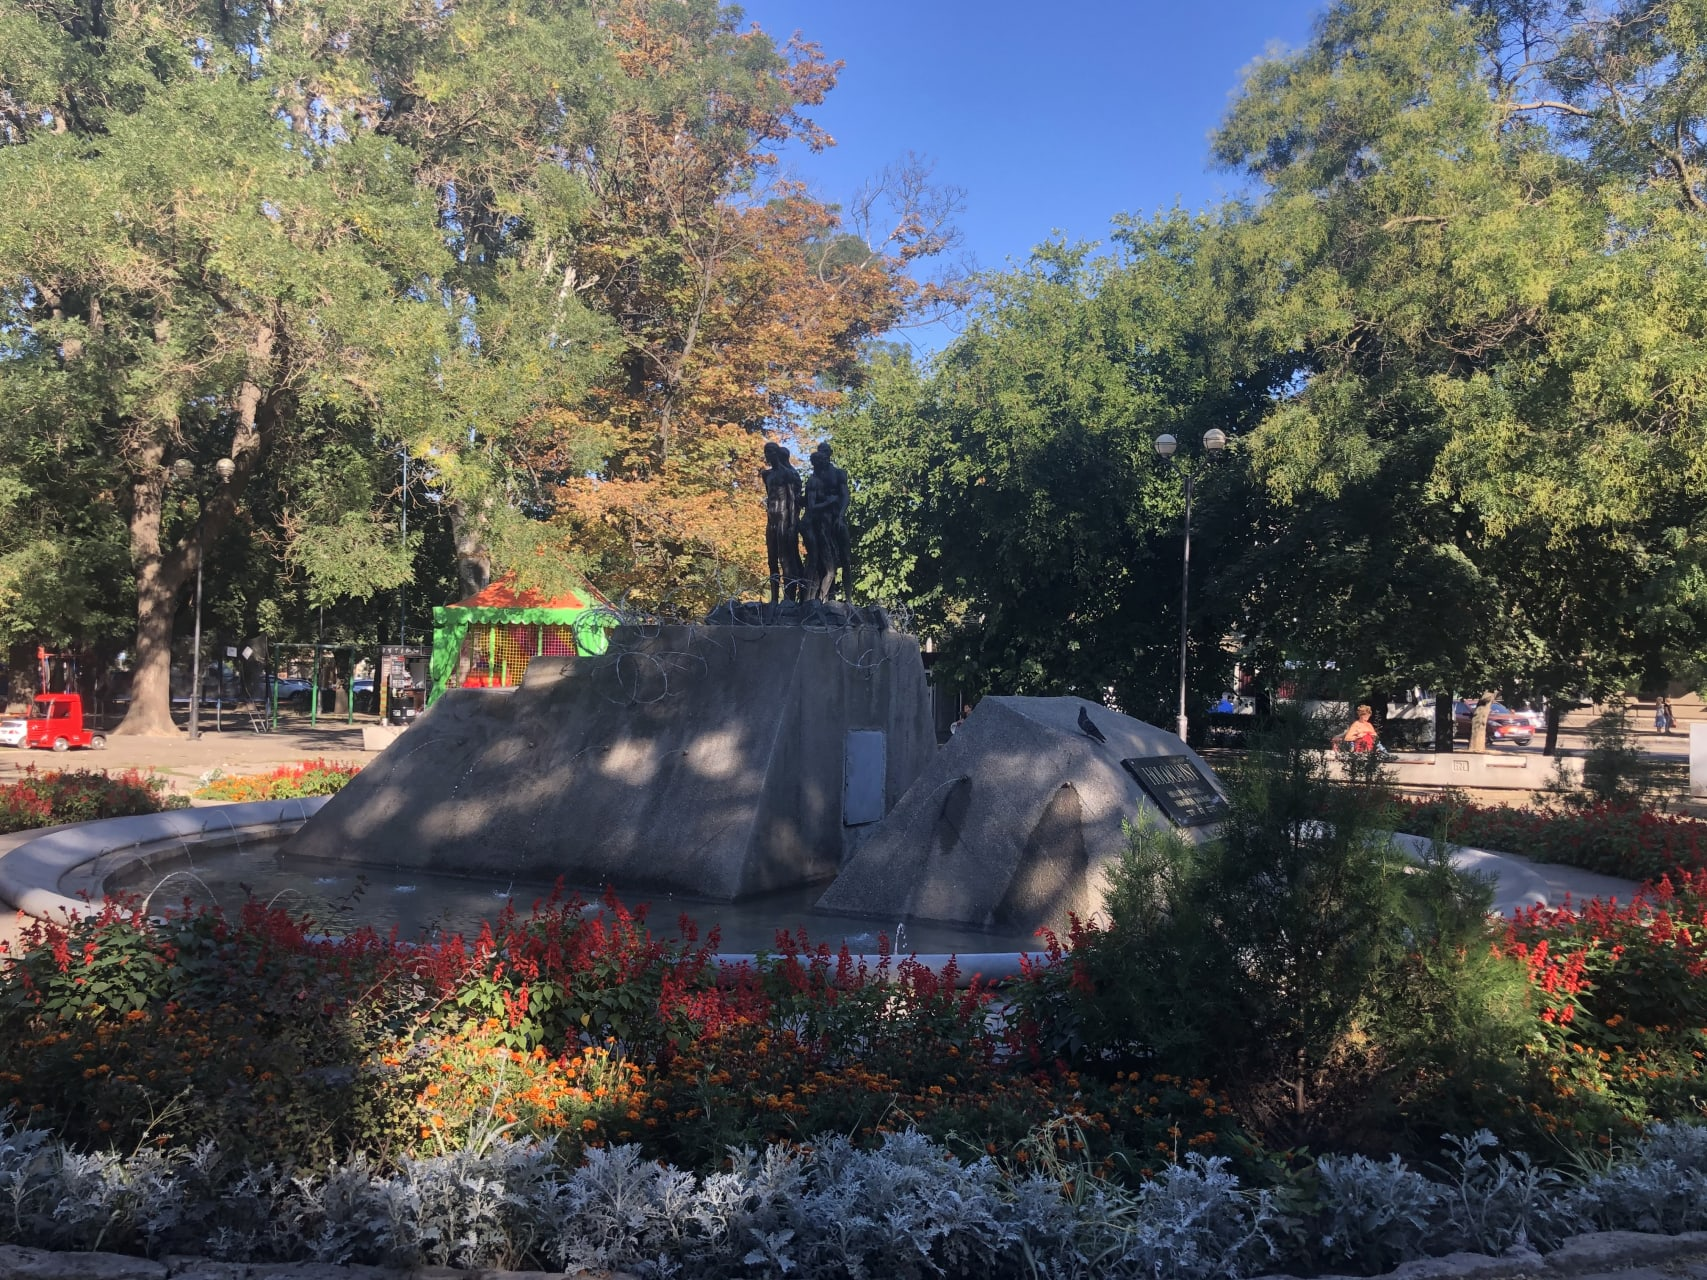 Odessa - Jewish Odessa Tour Part 3: Moldavanka Neighborhood and the Holocaust